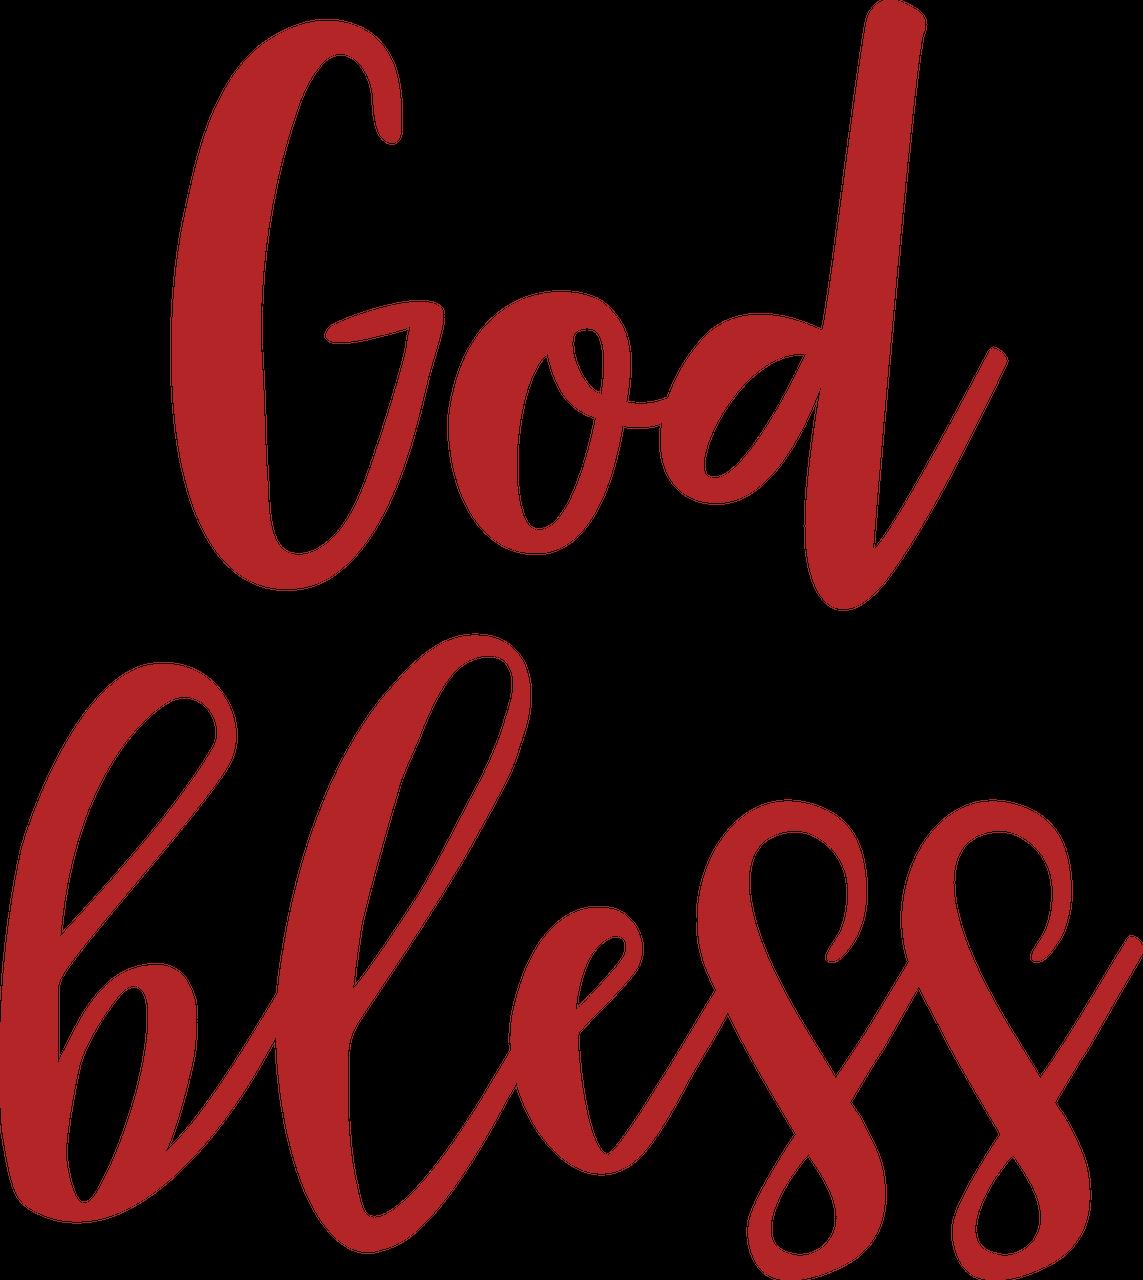 God Bless SVG Cut File